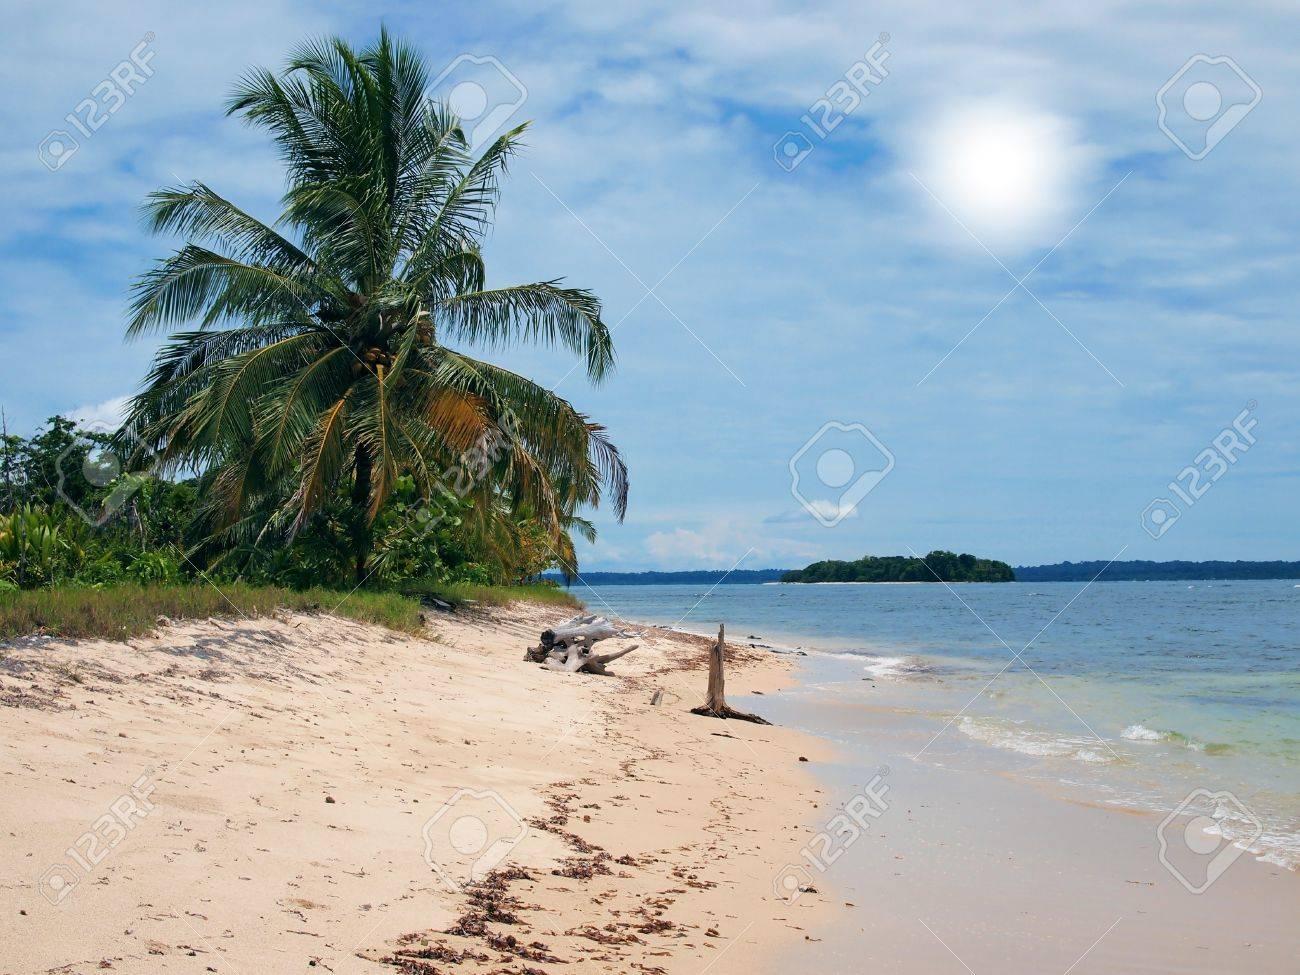 Beach with coconut tree in Zapatillas islands,Caribbean, Bocas del Toro, Panama Stock Photo - 10802073